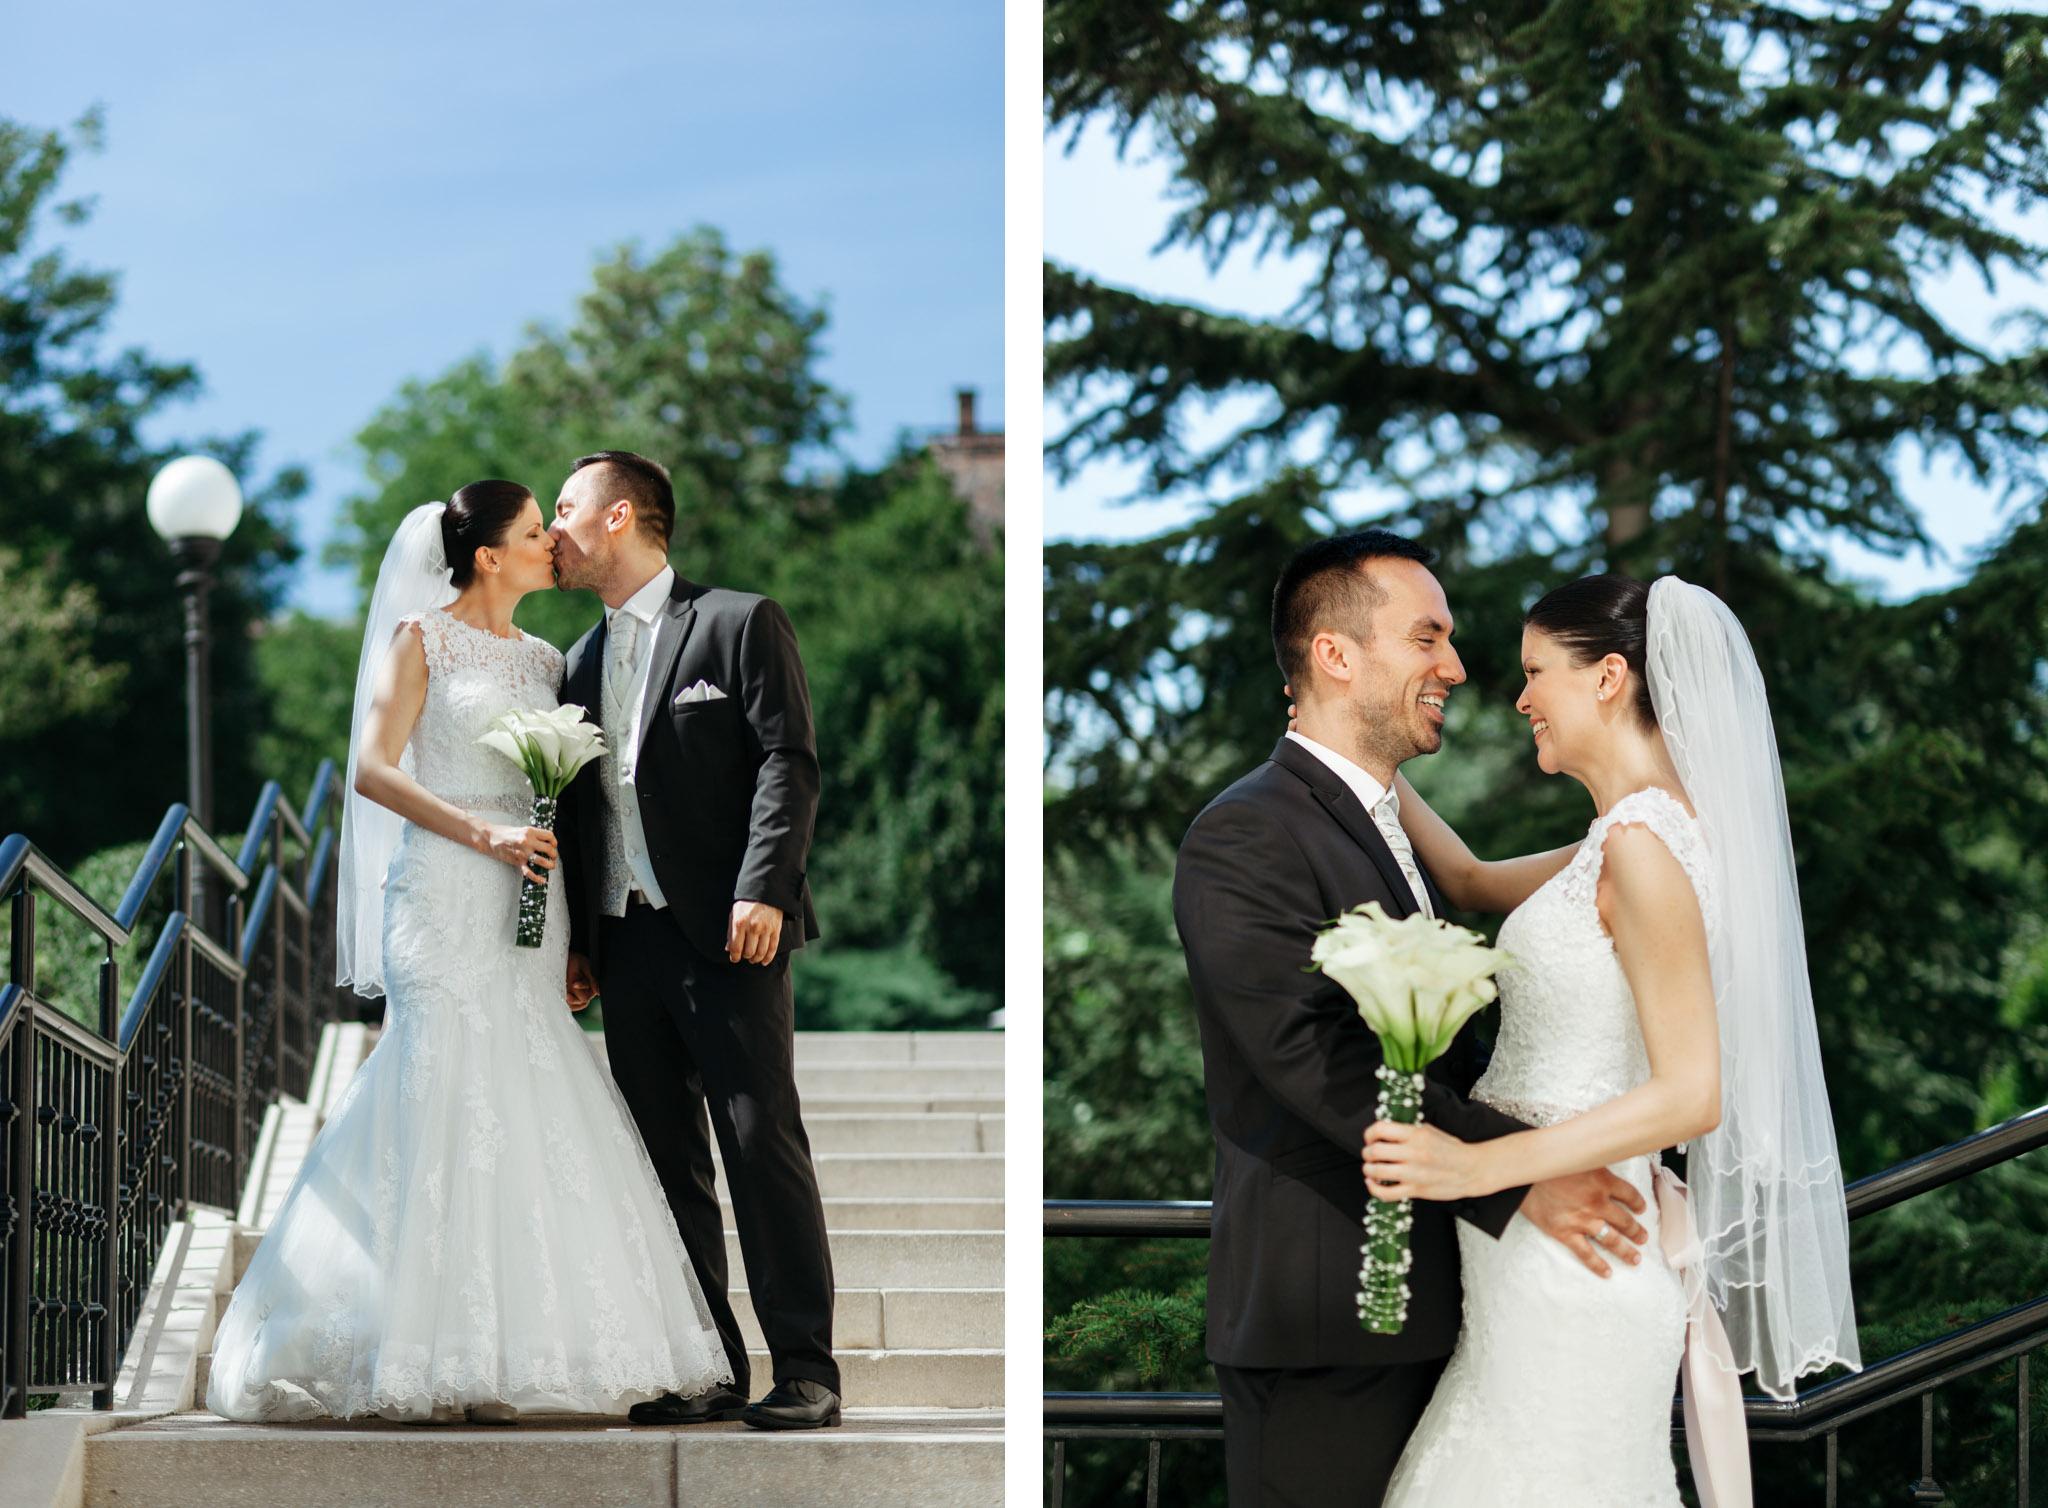 eskuvo_fotozas_wedding_foto_lenart_gabor_sztyui_budapest_IMG_5292